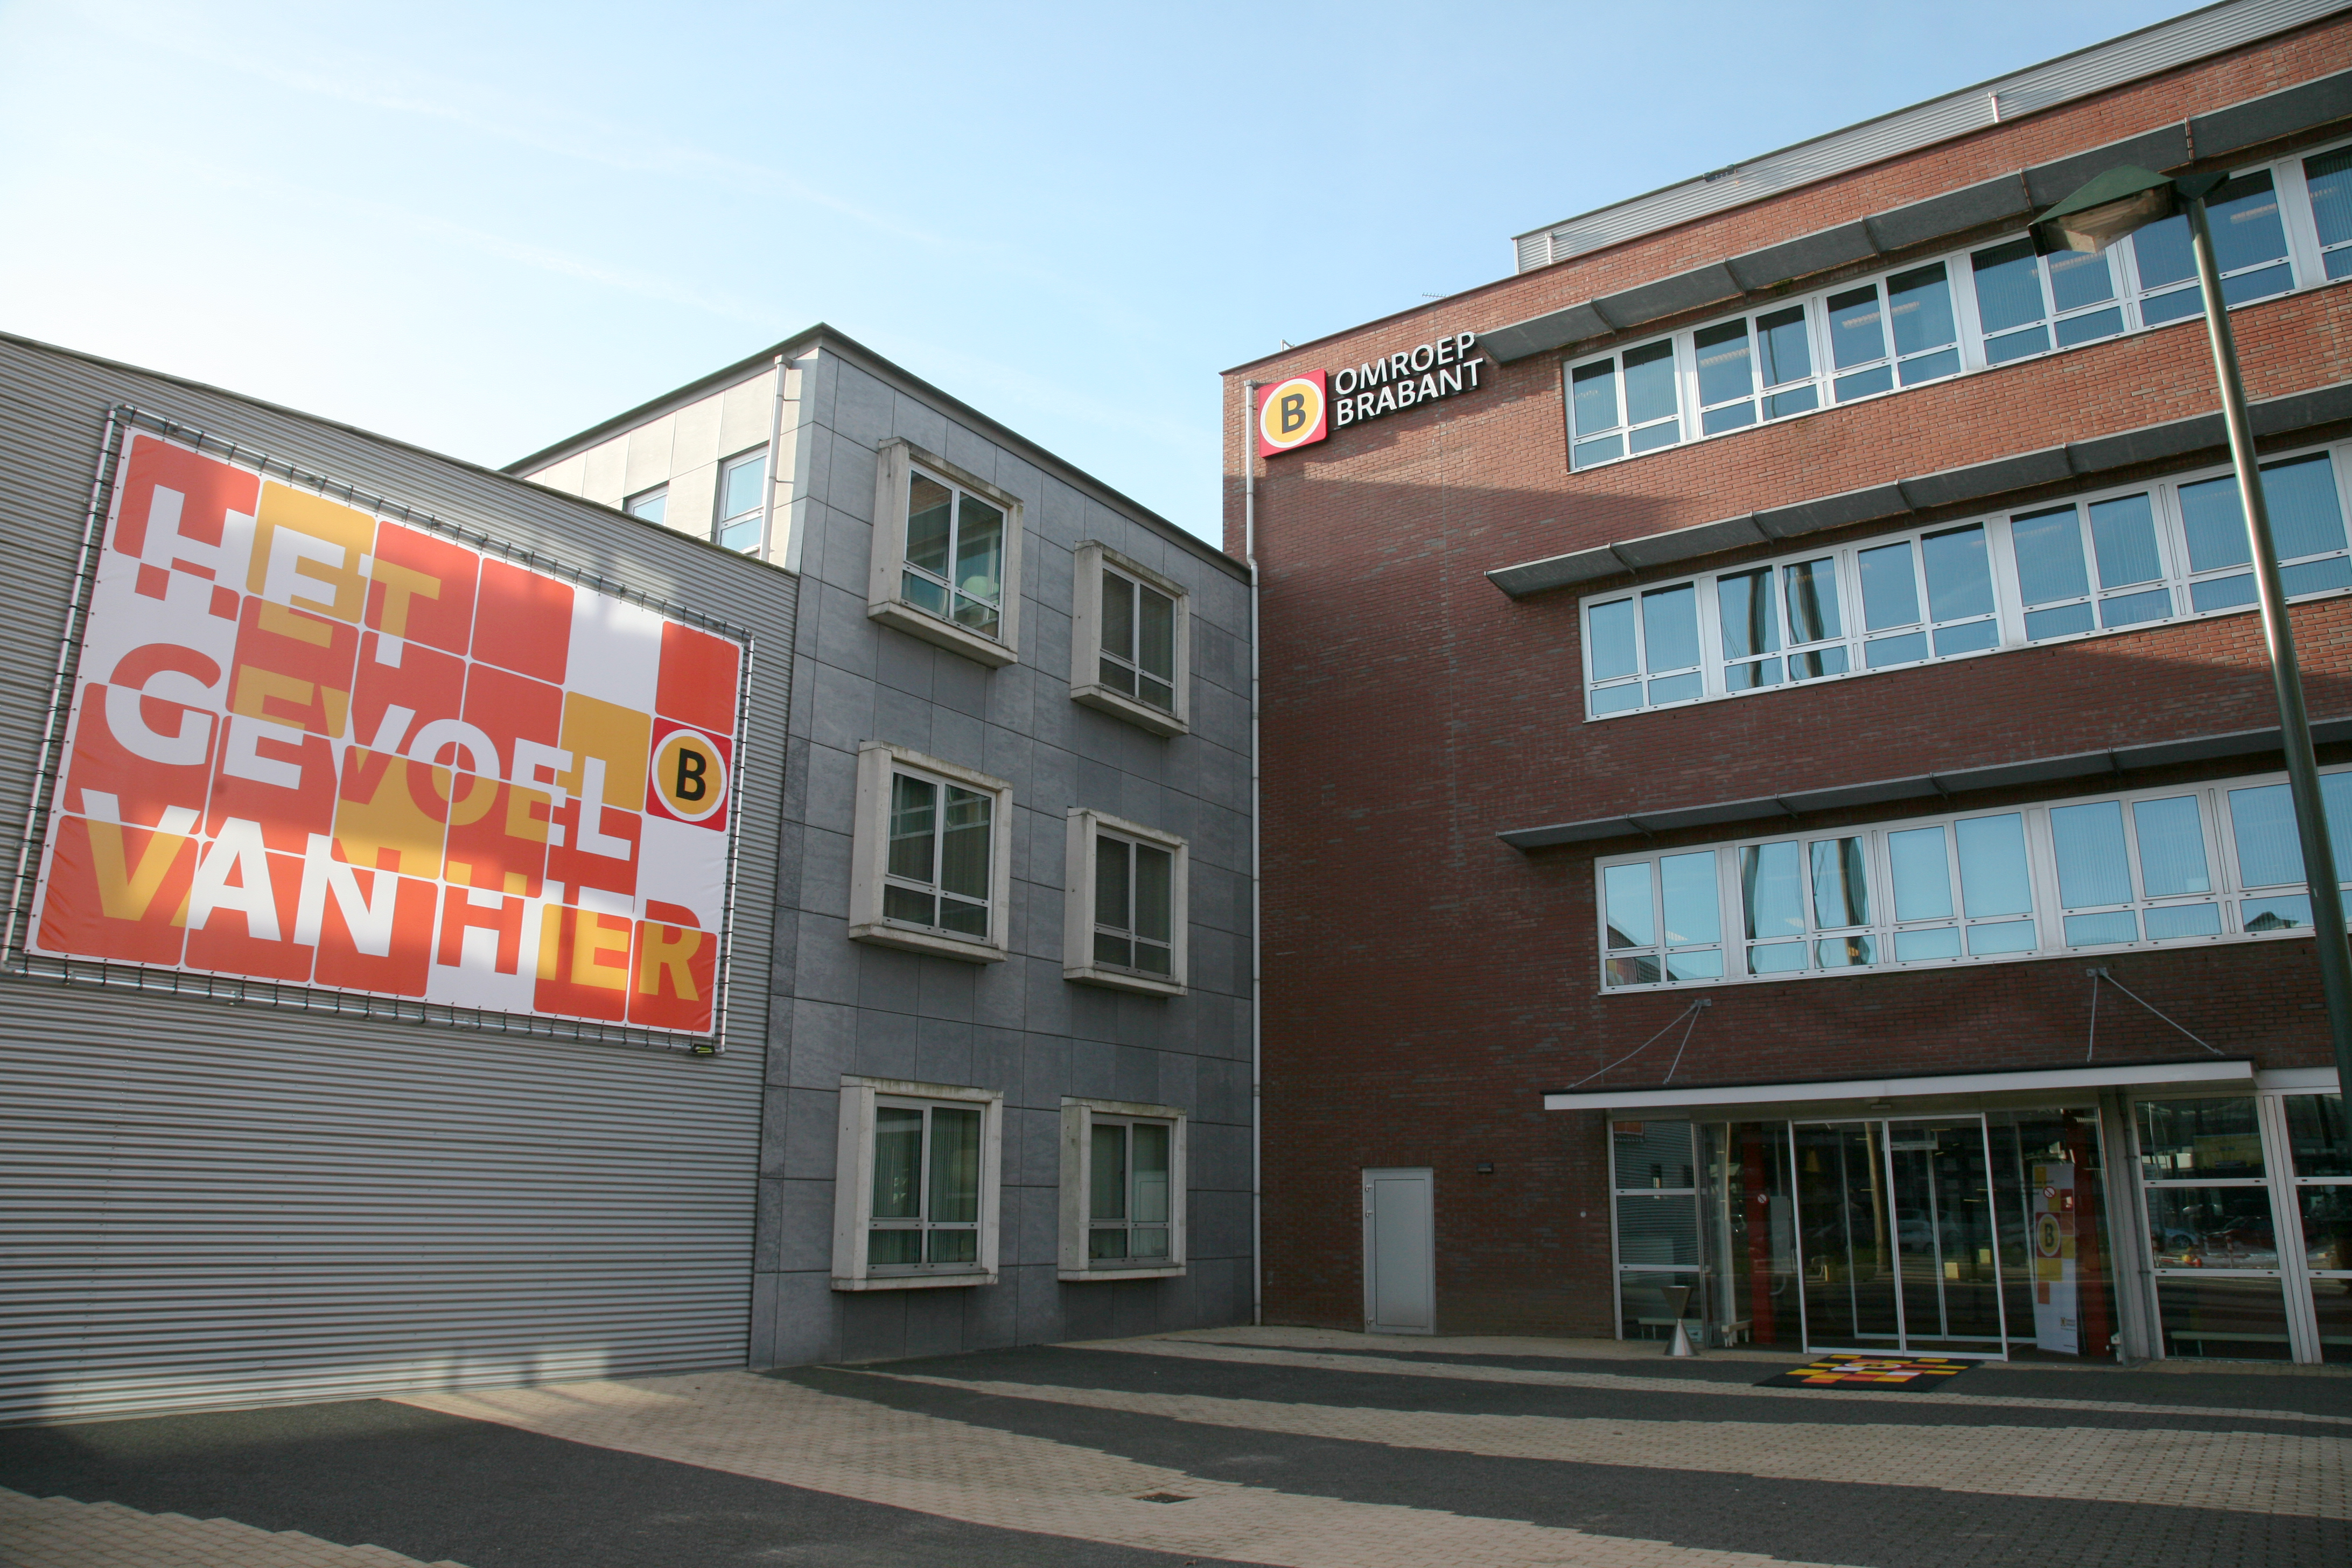 File:Gebouw Omroep Brabant in Son, Noord-Brabant.jpg - Wikimedia ...